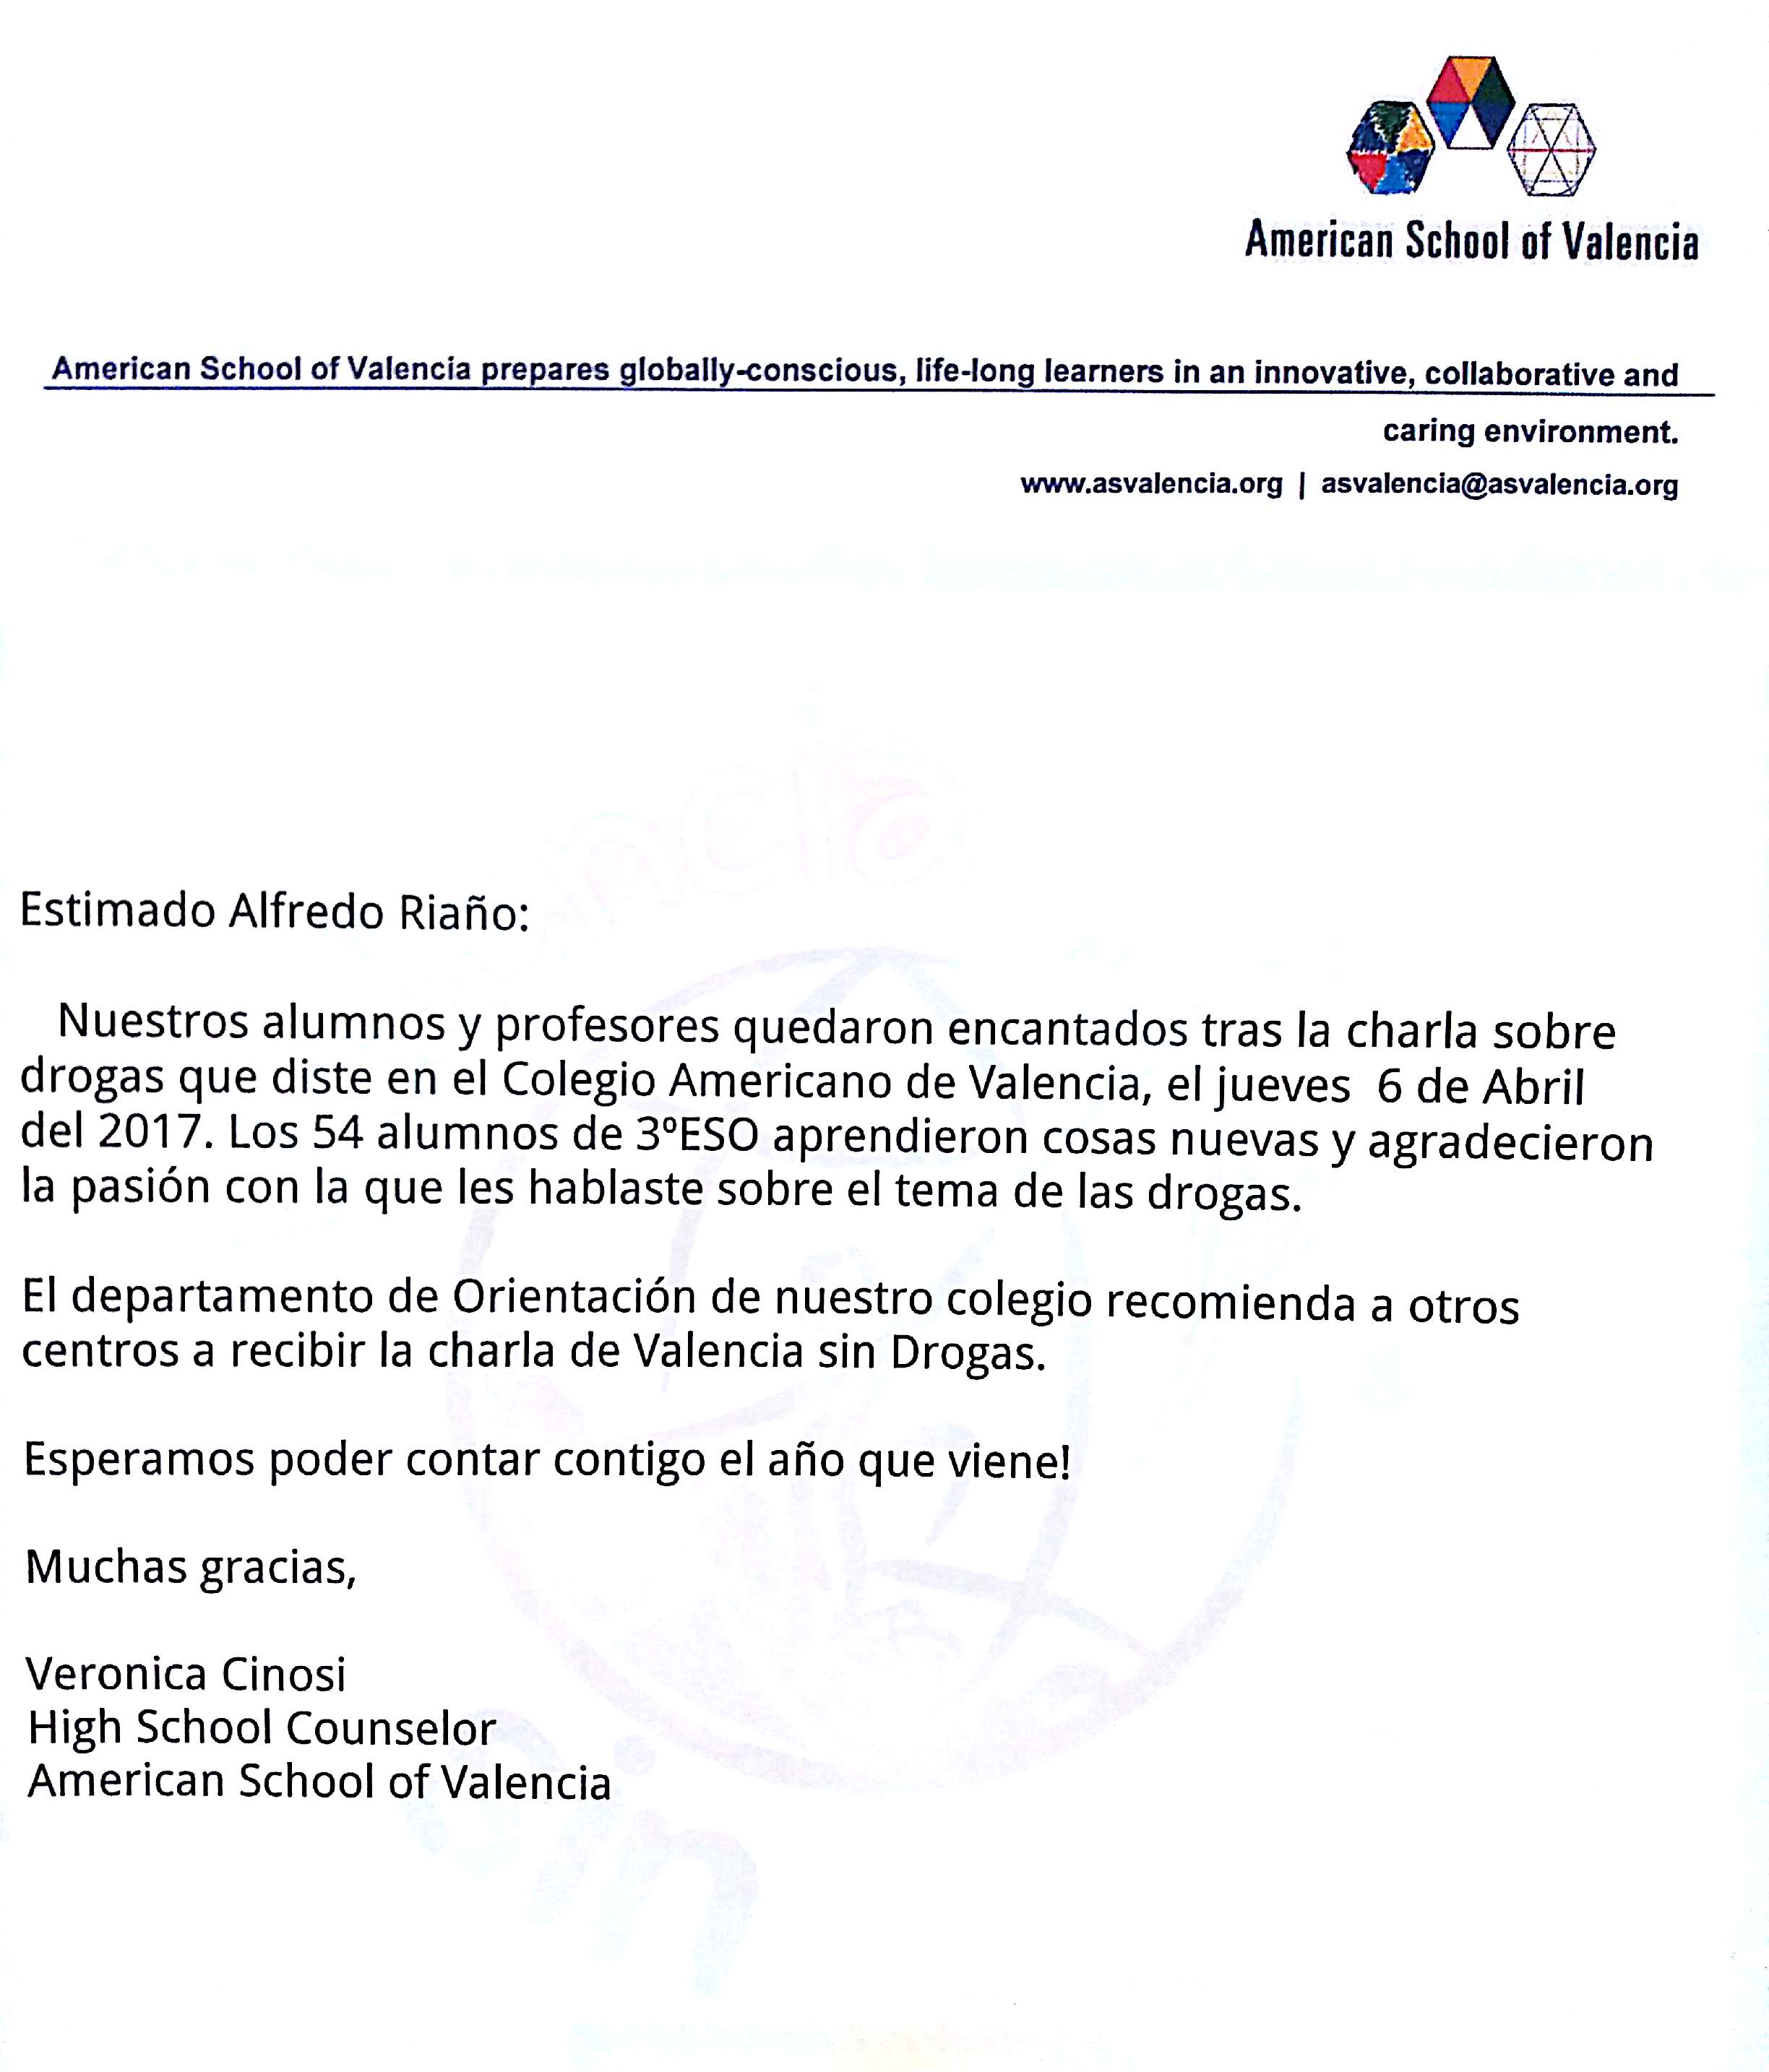 NuevoDocumento 2017-04-12